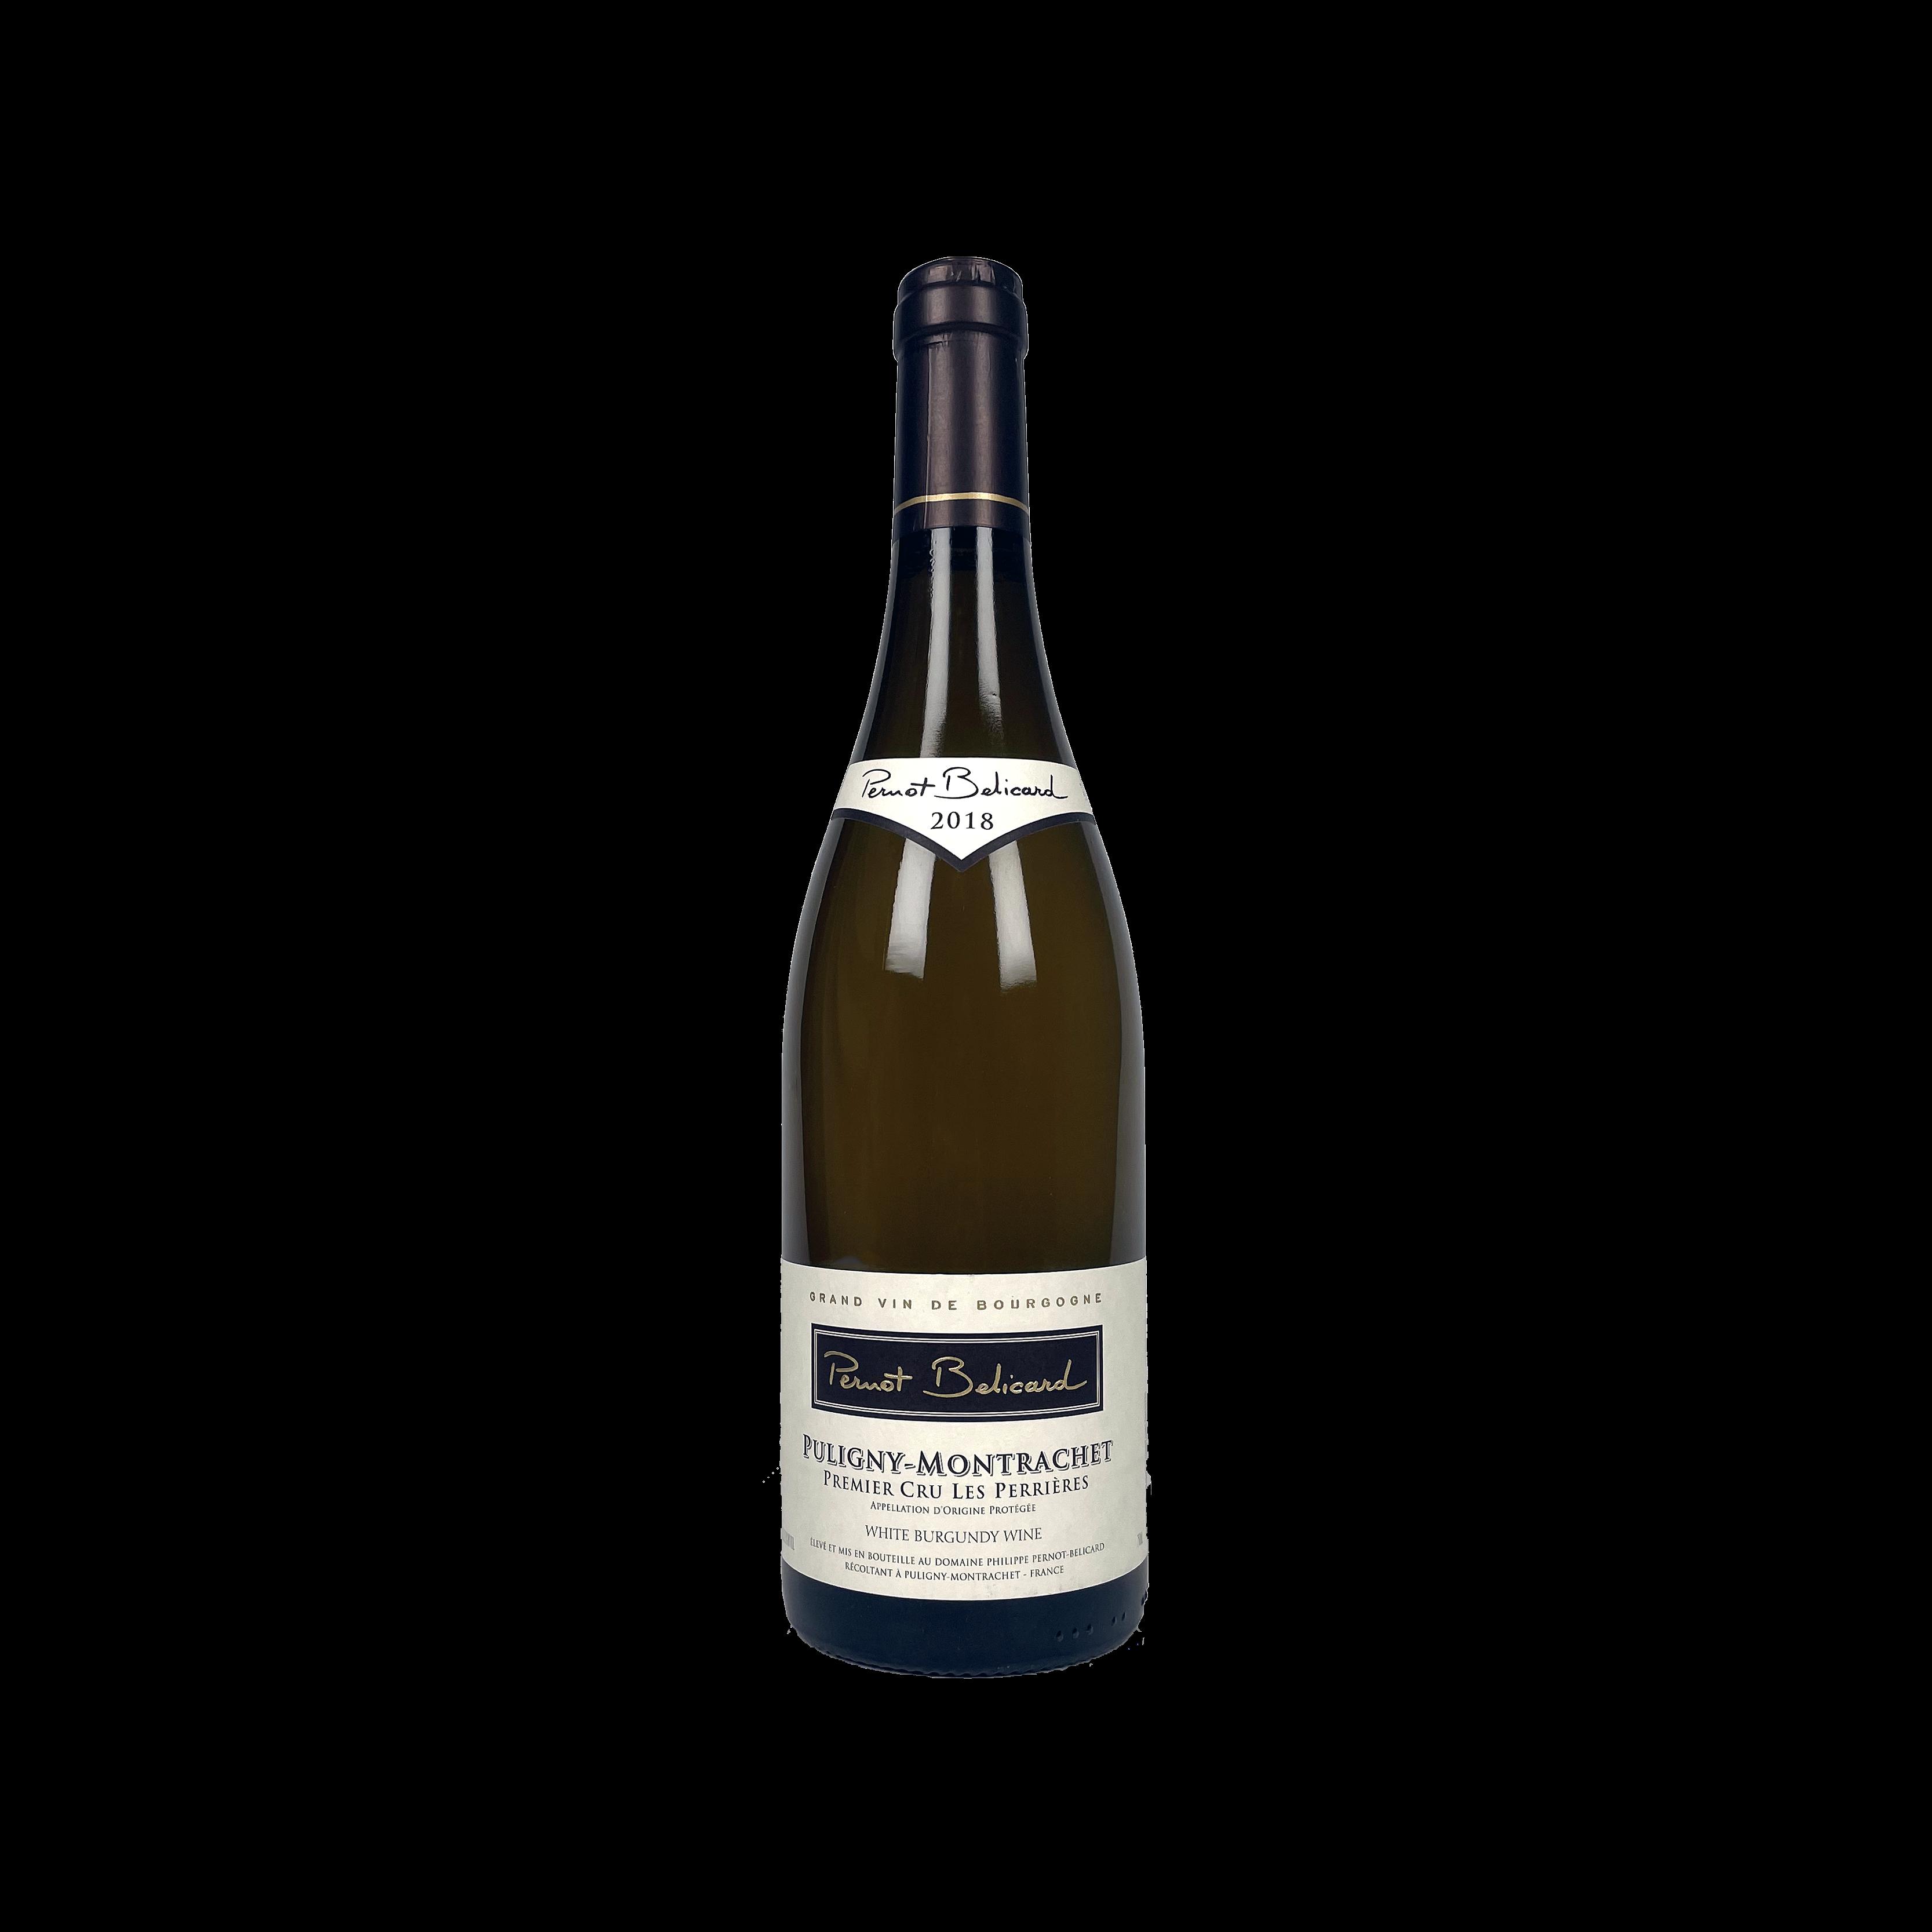 Pernot Belicard Puligny Montrachet 1er Cru Les Perrieres, 2018, 75CL